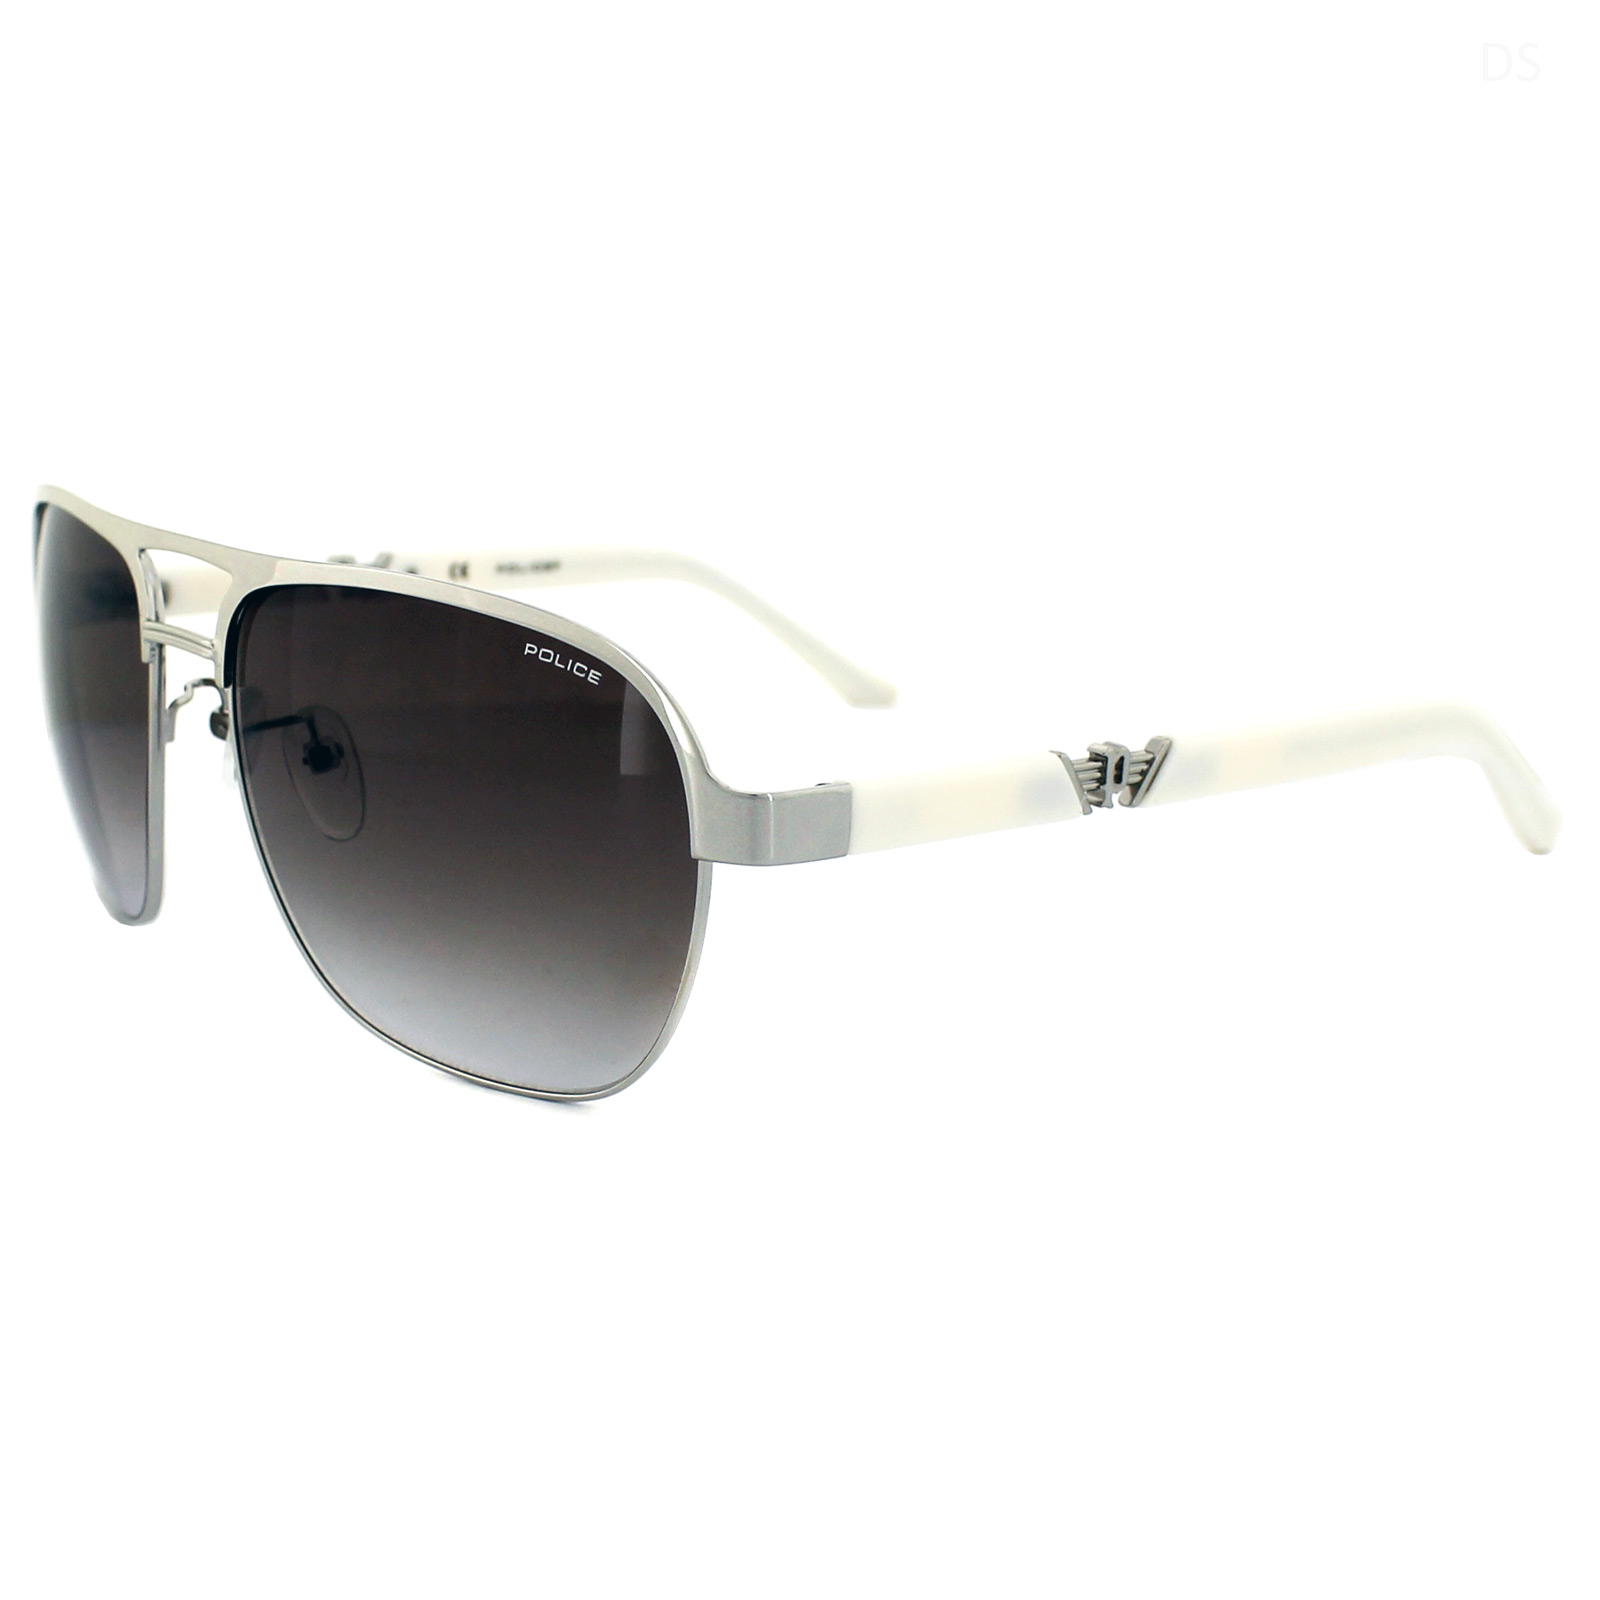 66393cdcdb Sentinel Police Sunglasses Drift 4 8752 579 Light Gold   White Brown  Gradient